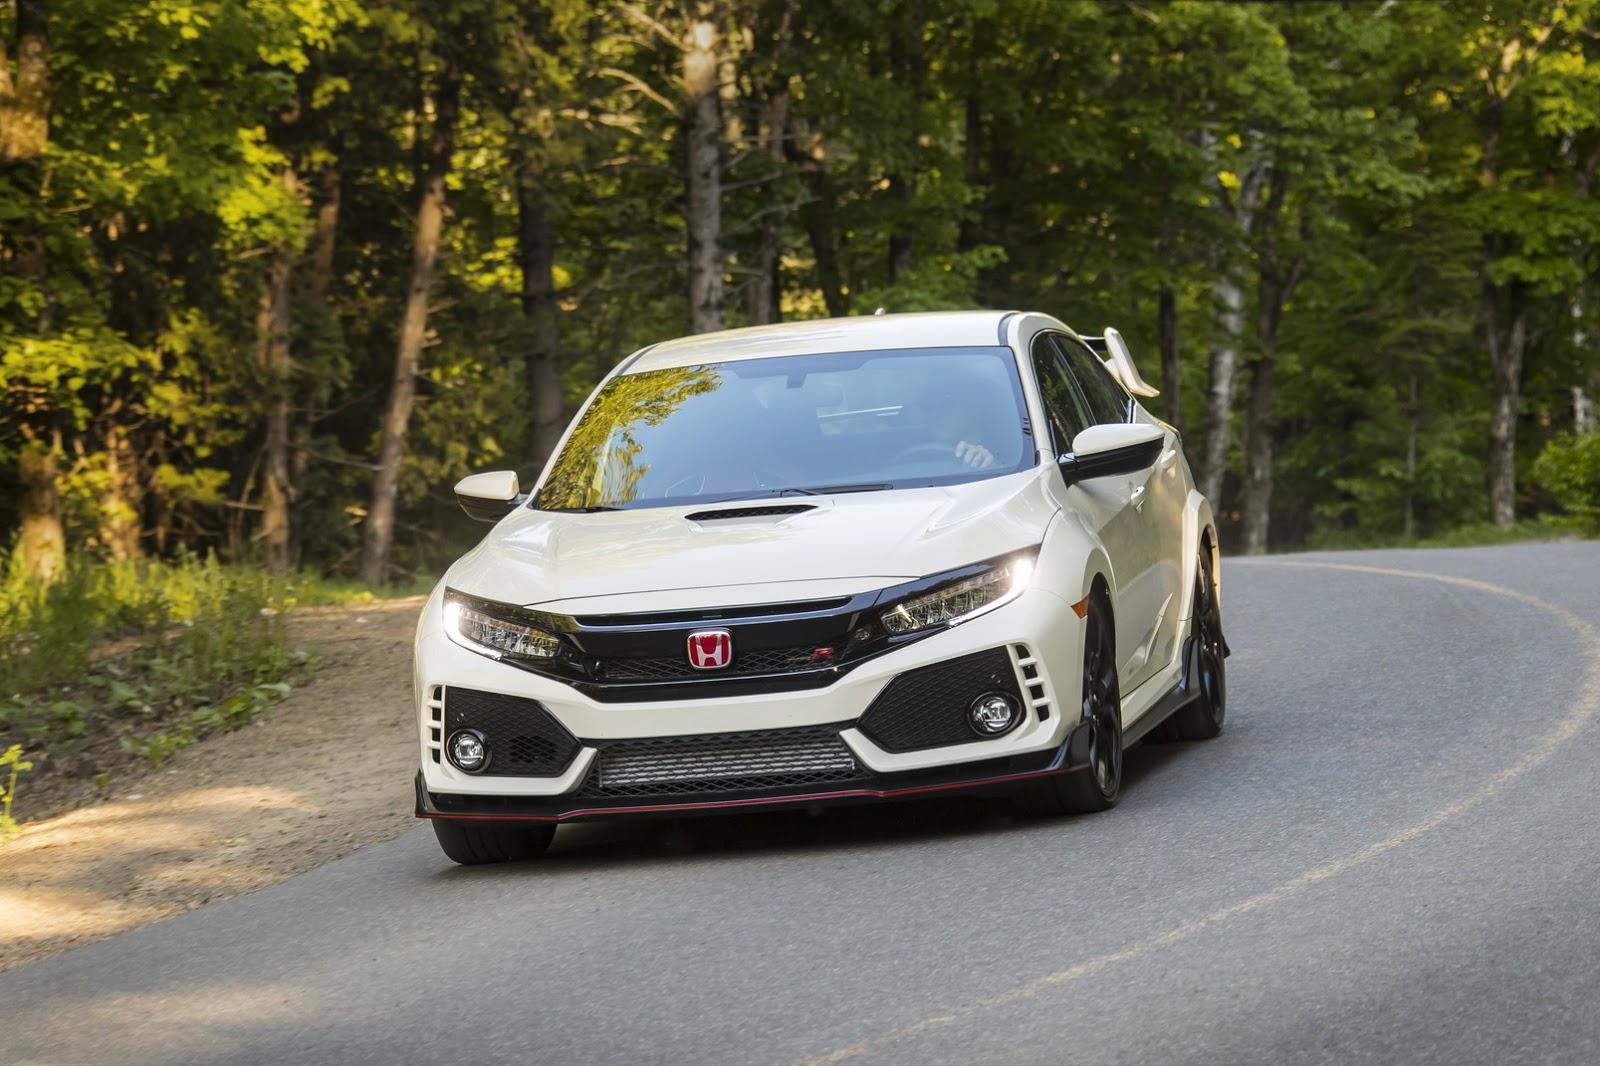 2017_Honda_Civic_Type_R_159